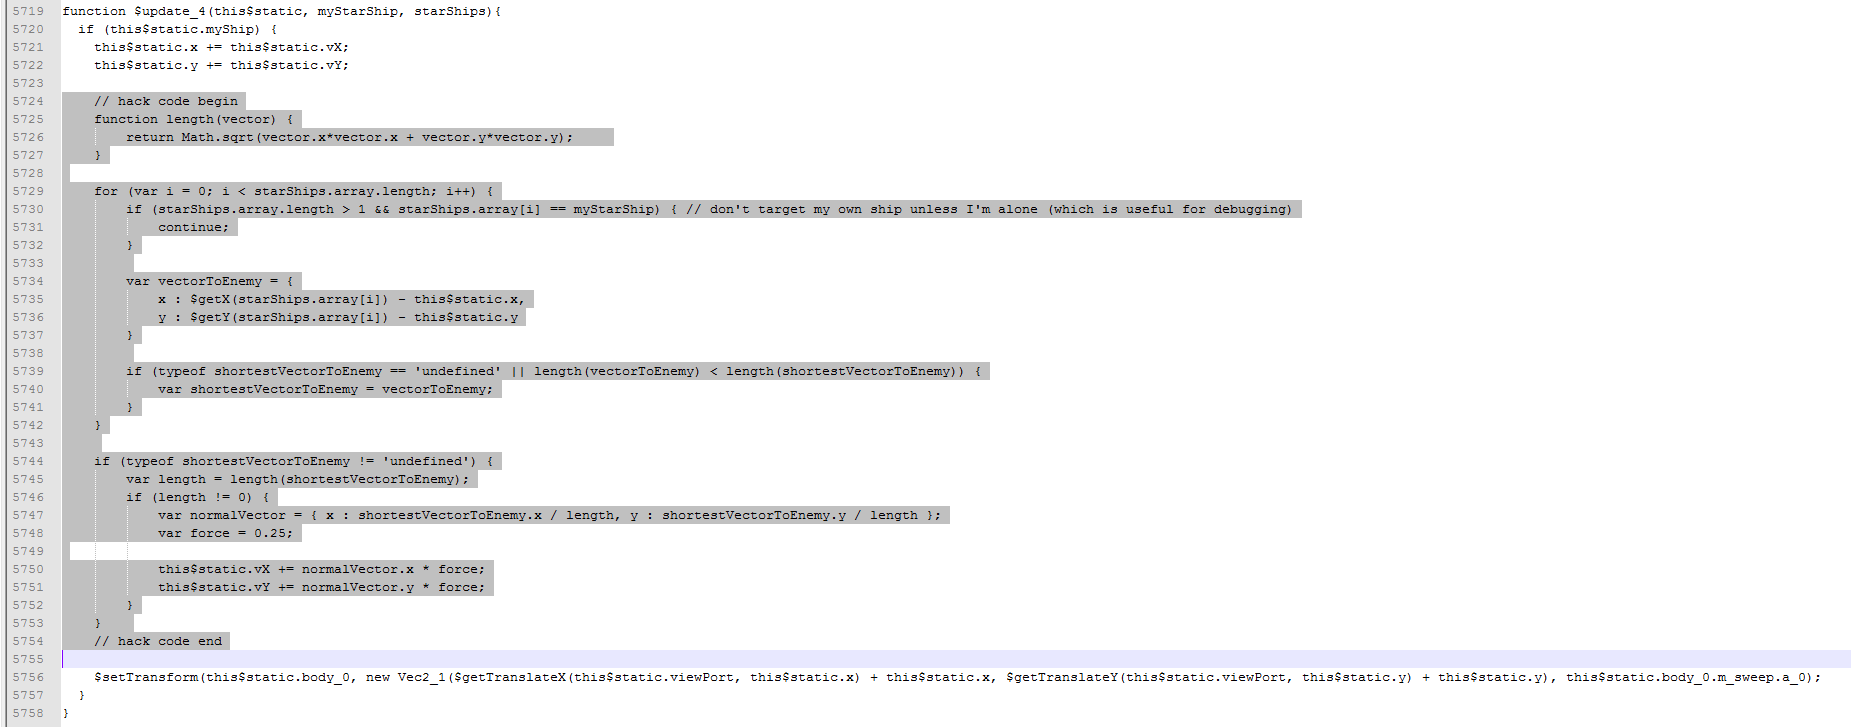 hackcode2